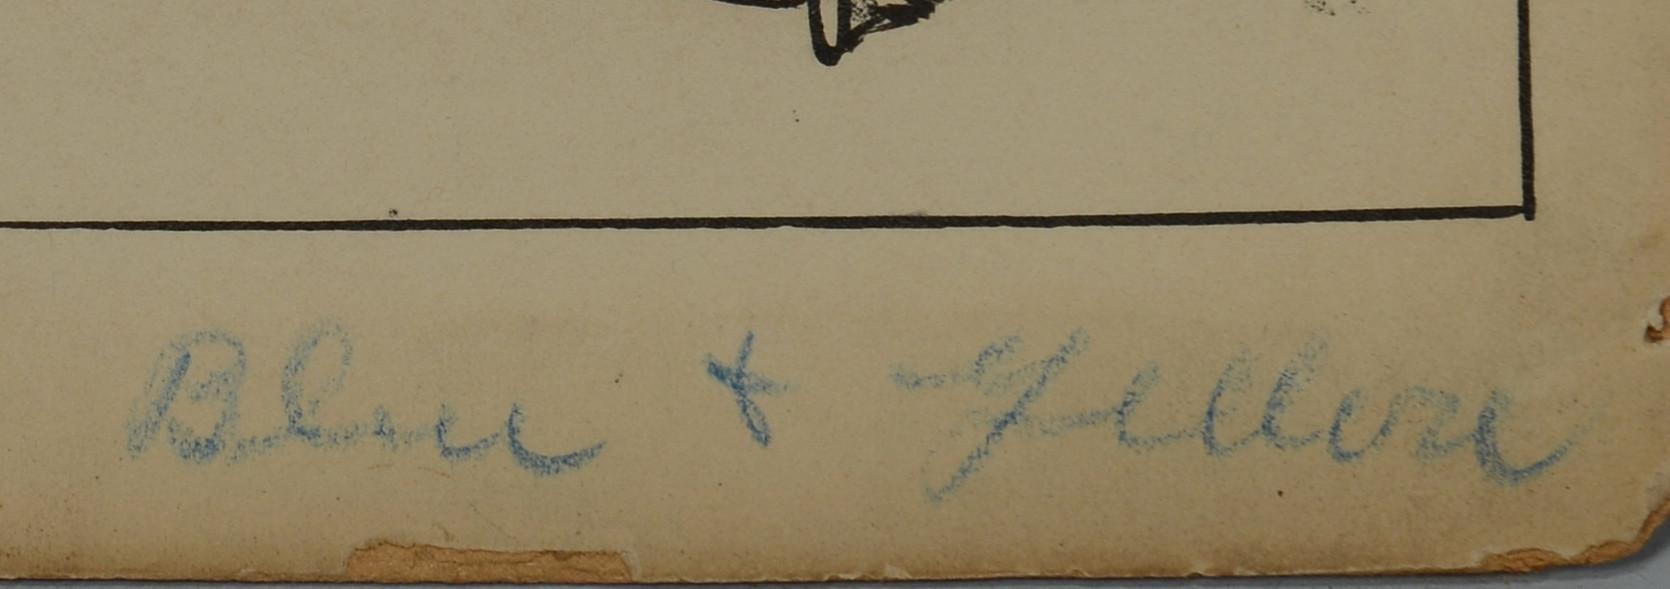 Lot 529: Louis Wisa Pen & Ink Illustration